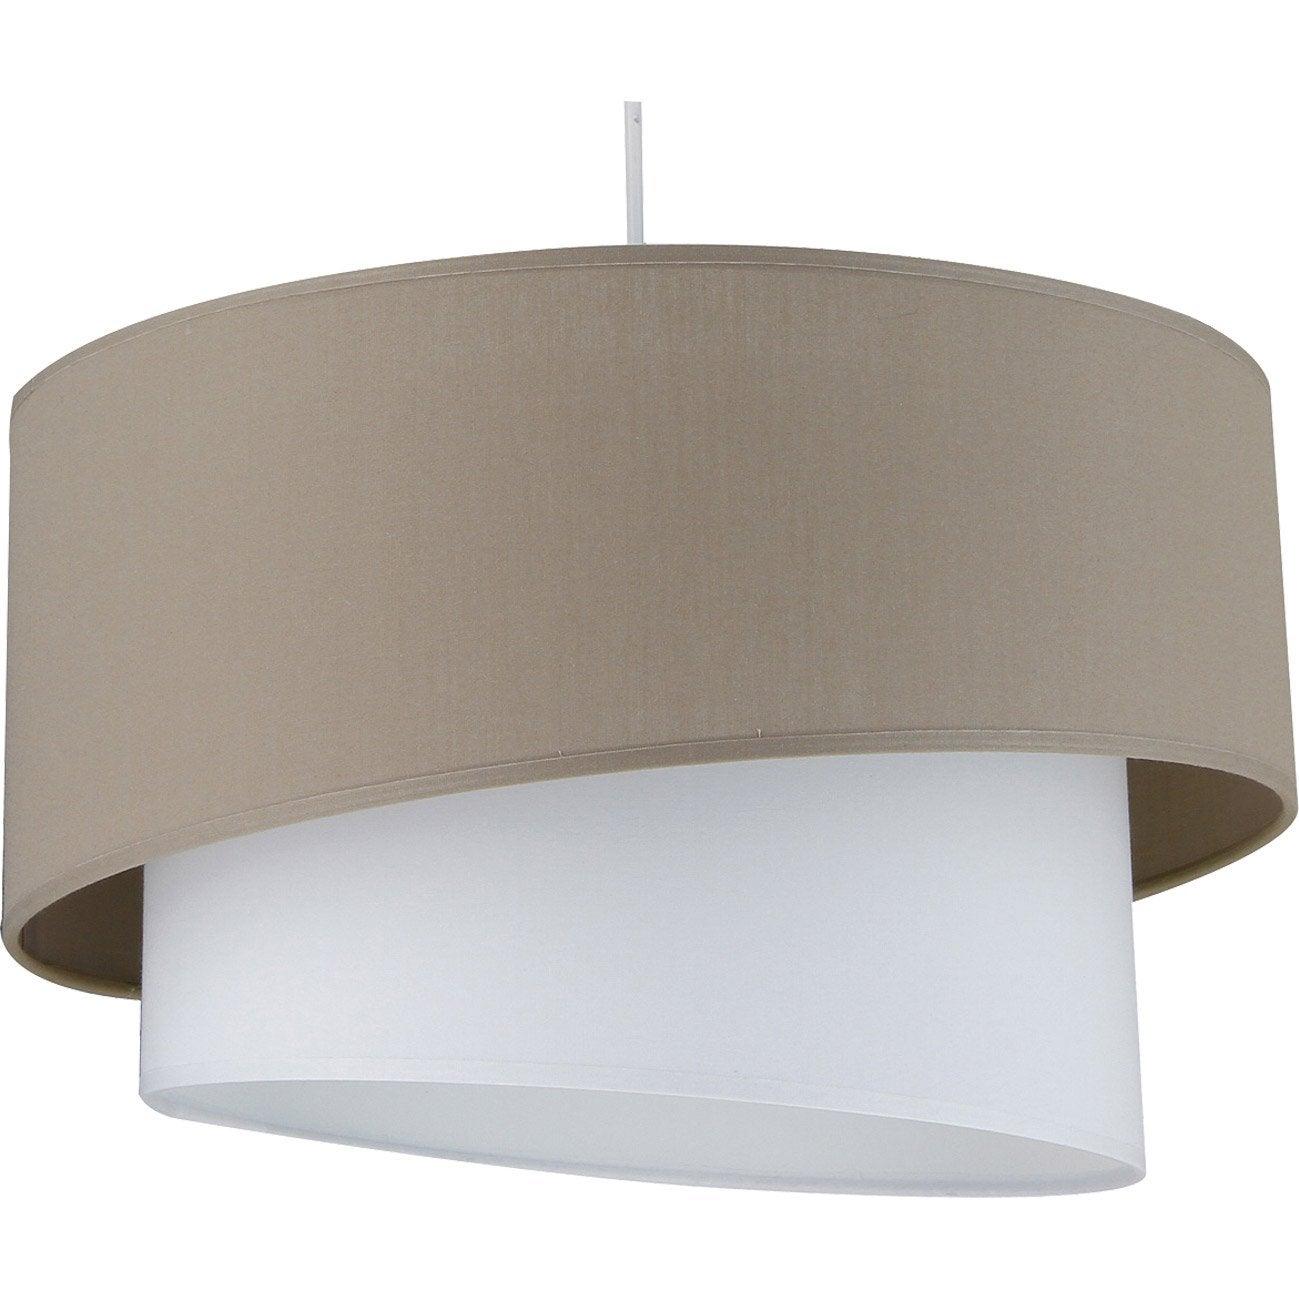 suspension e27 design ionos coton brun taupe n 3 1 x 60 w metropolight leroy merlin. Black Bedroom Furniture Sets. Home Design Ideas